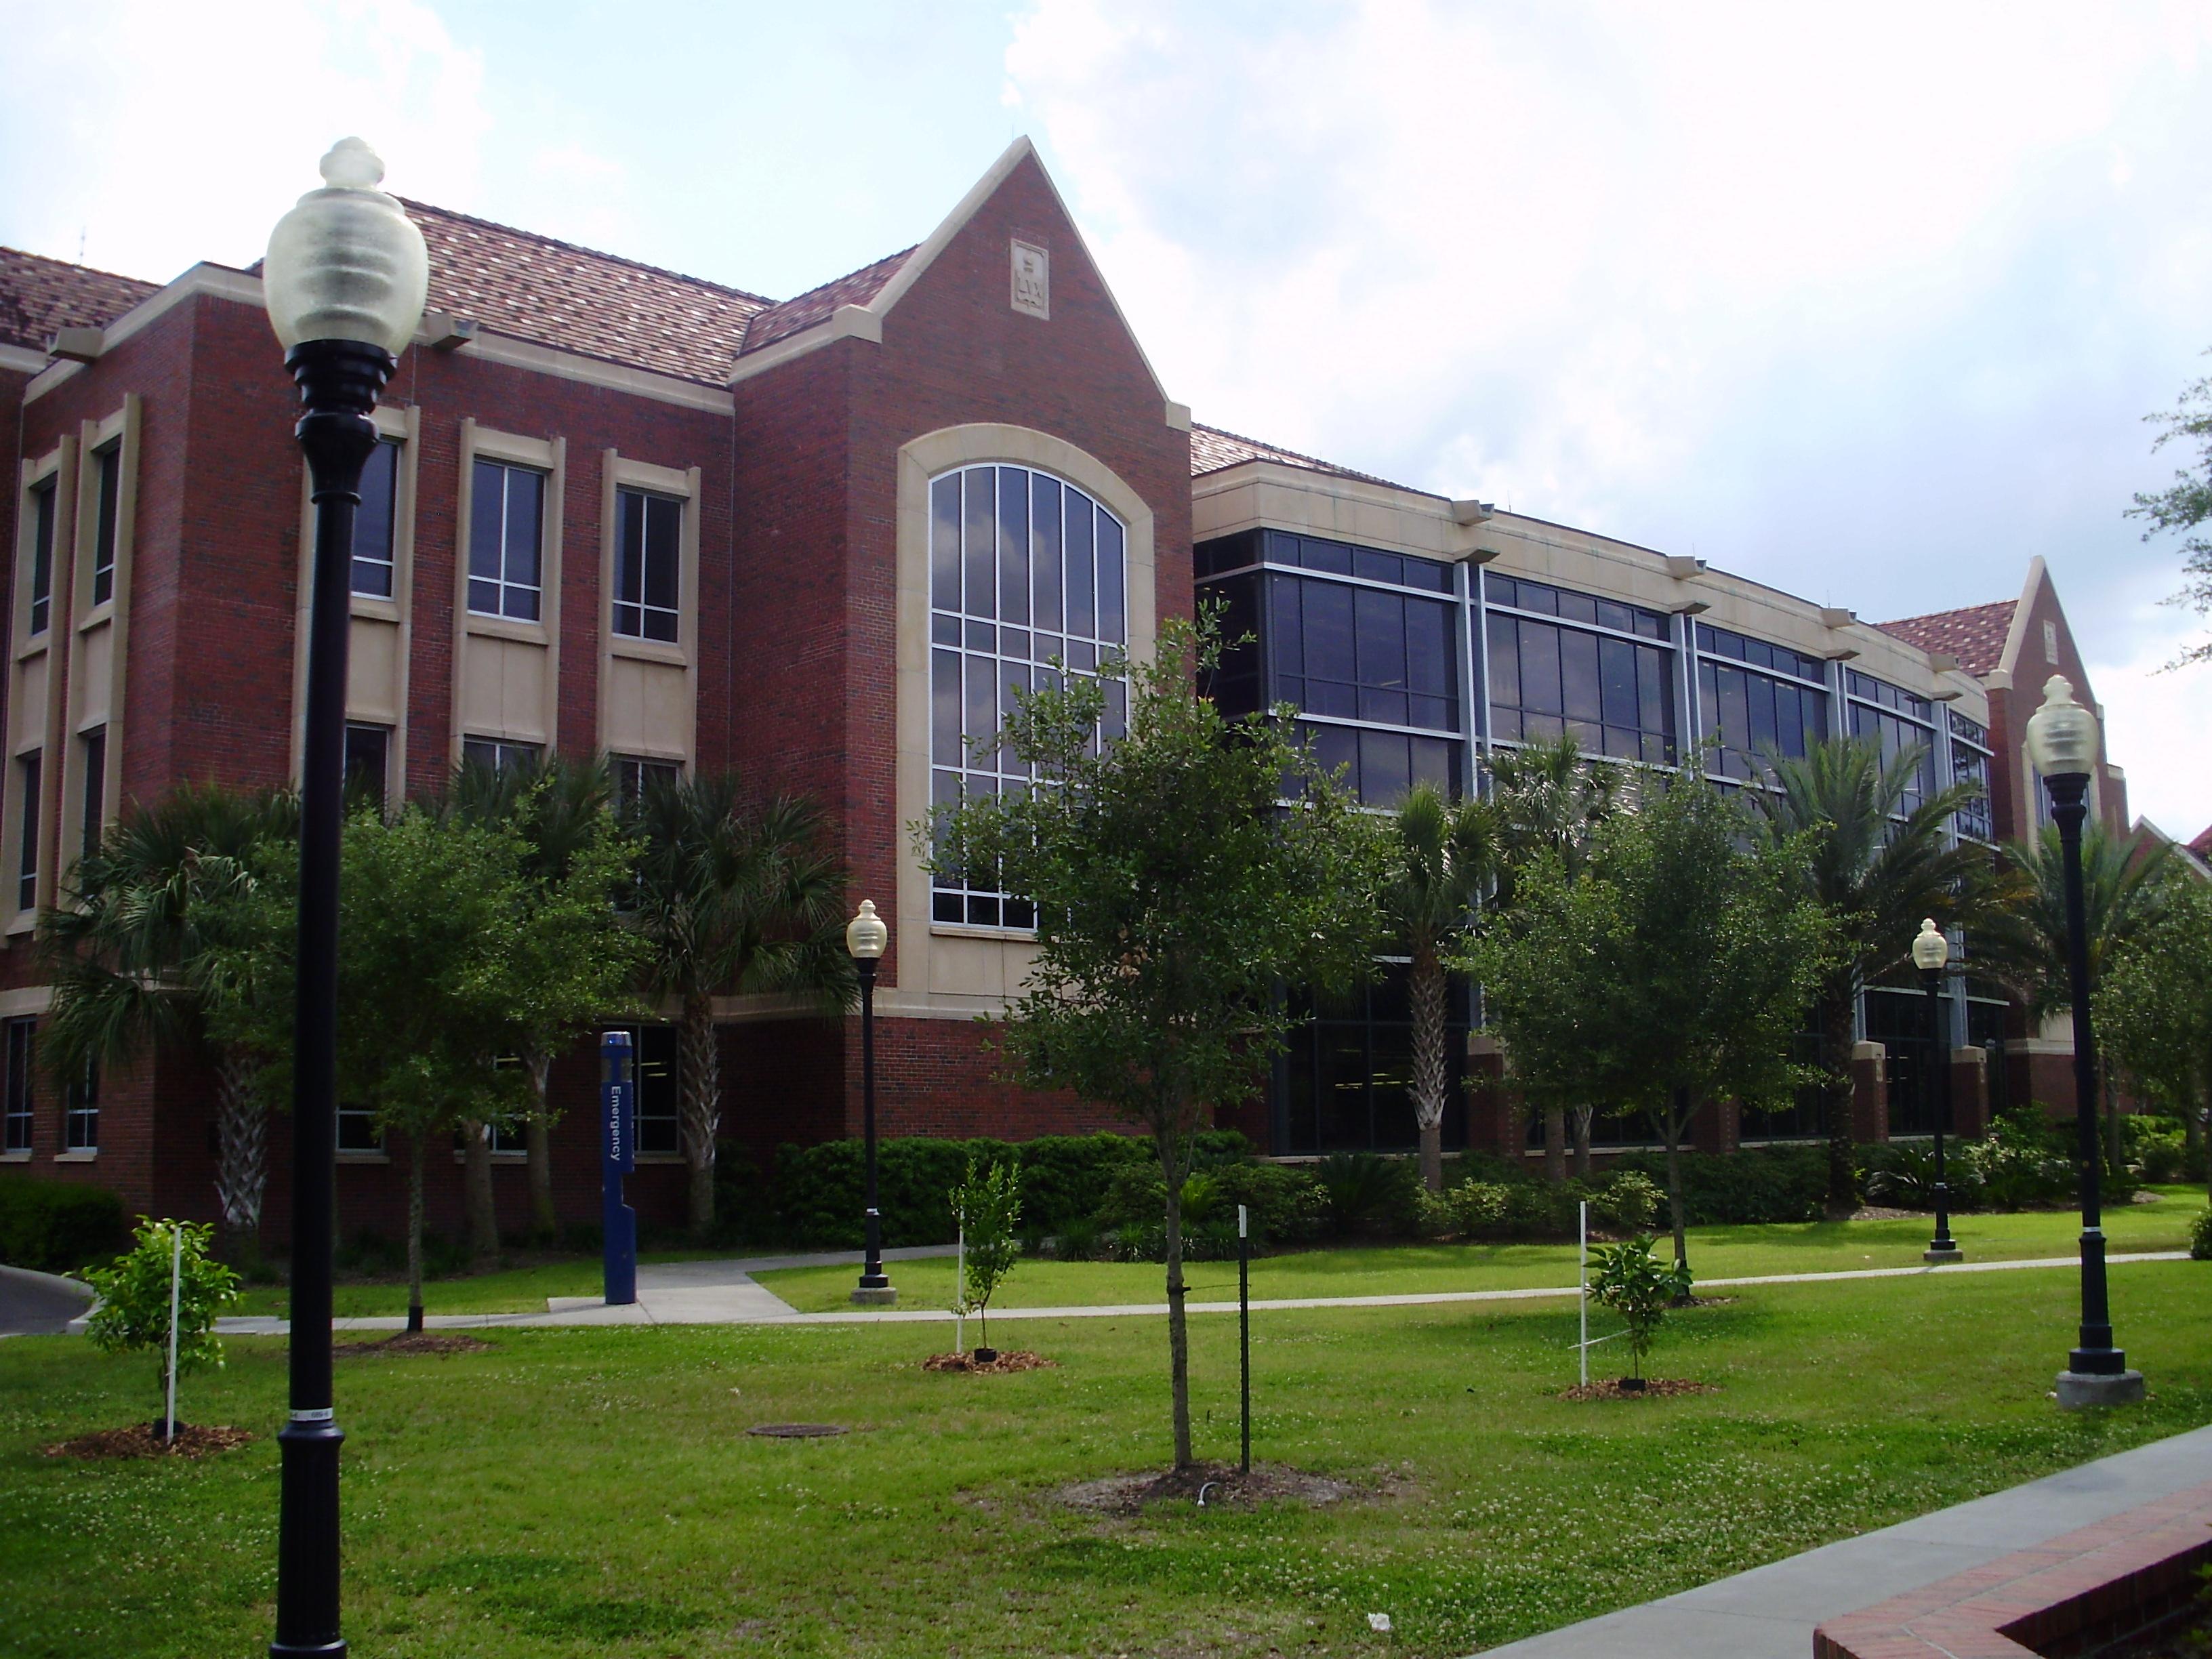 University of Florida Liry West - Wikipedia on